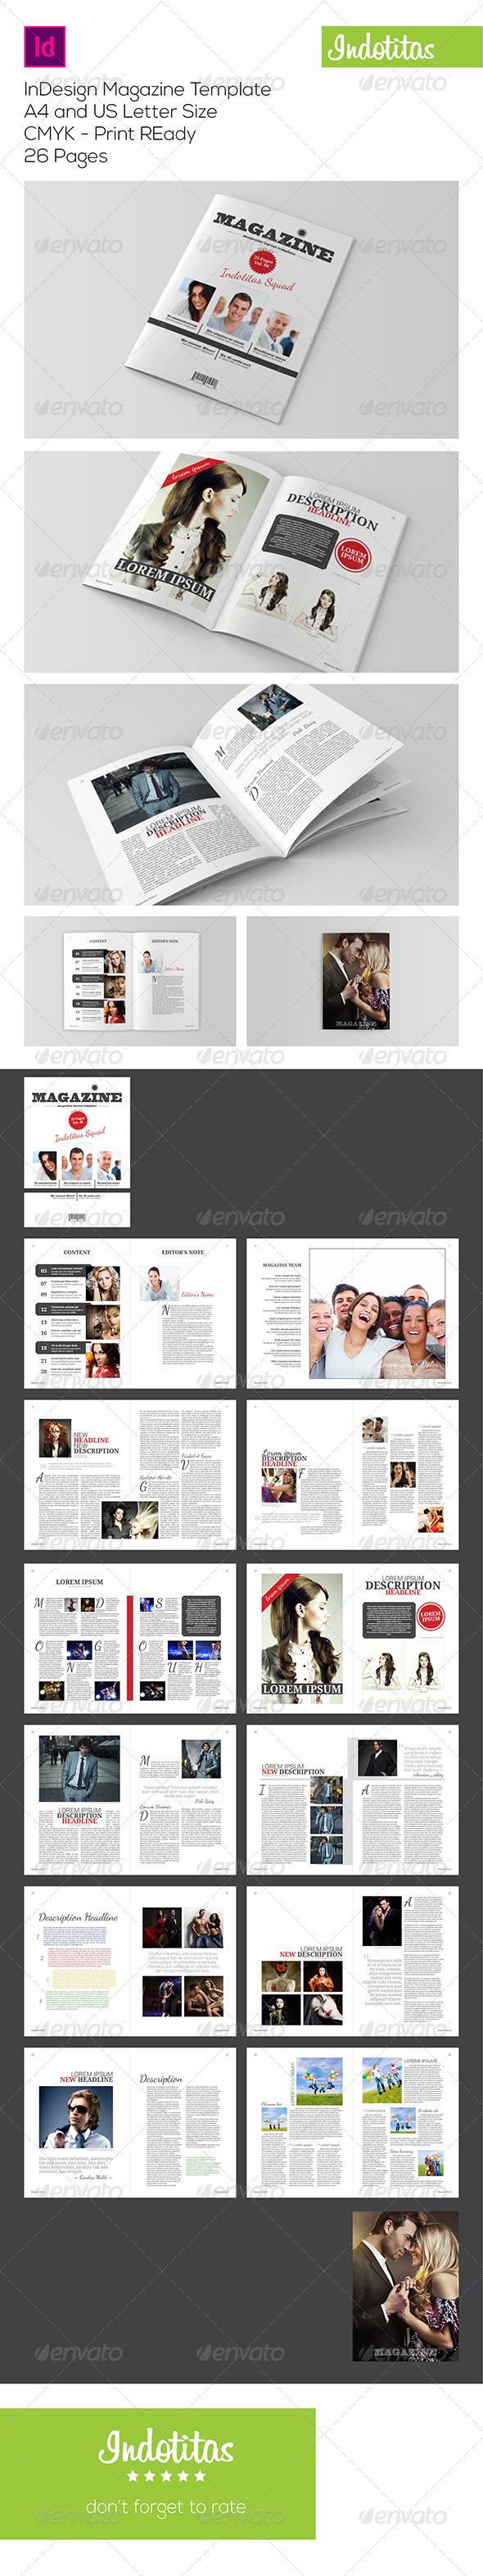 GraphicRiver InDesign Magazine Template 7223351